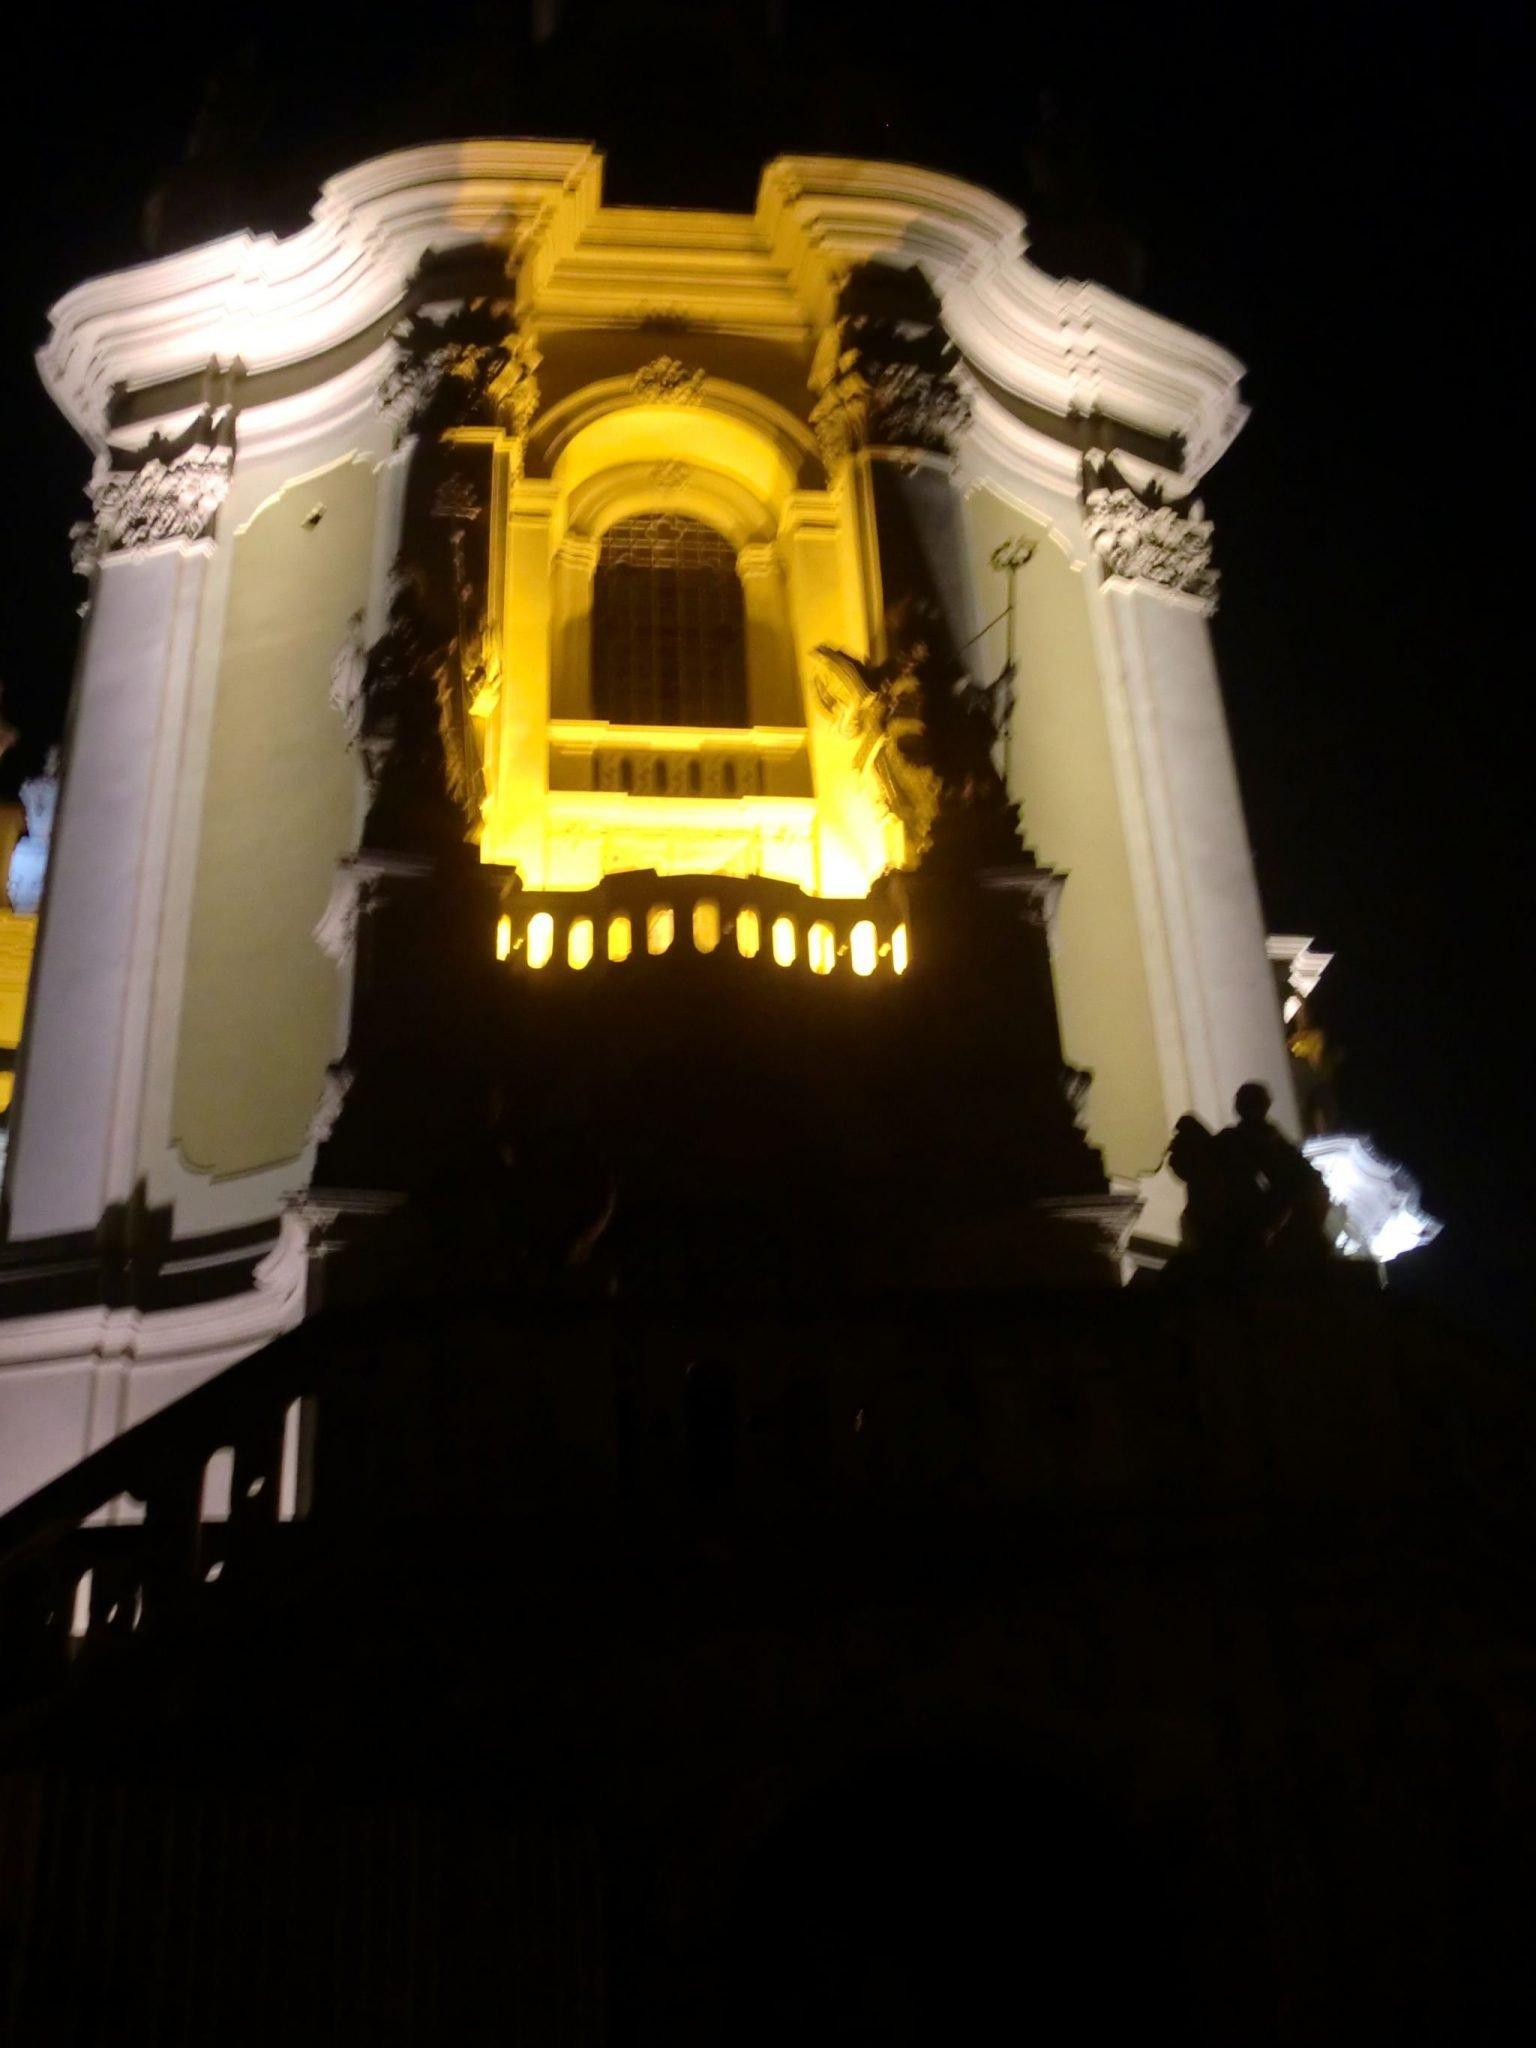 Lviv cathedral 2 - Lviv, the Ukrainian pearl